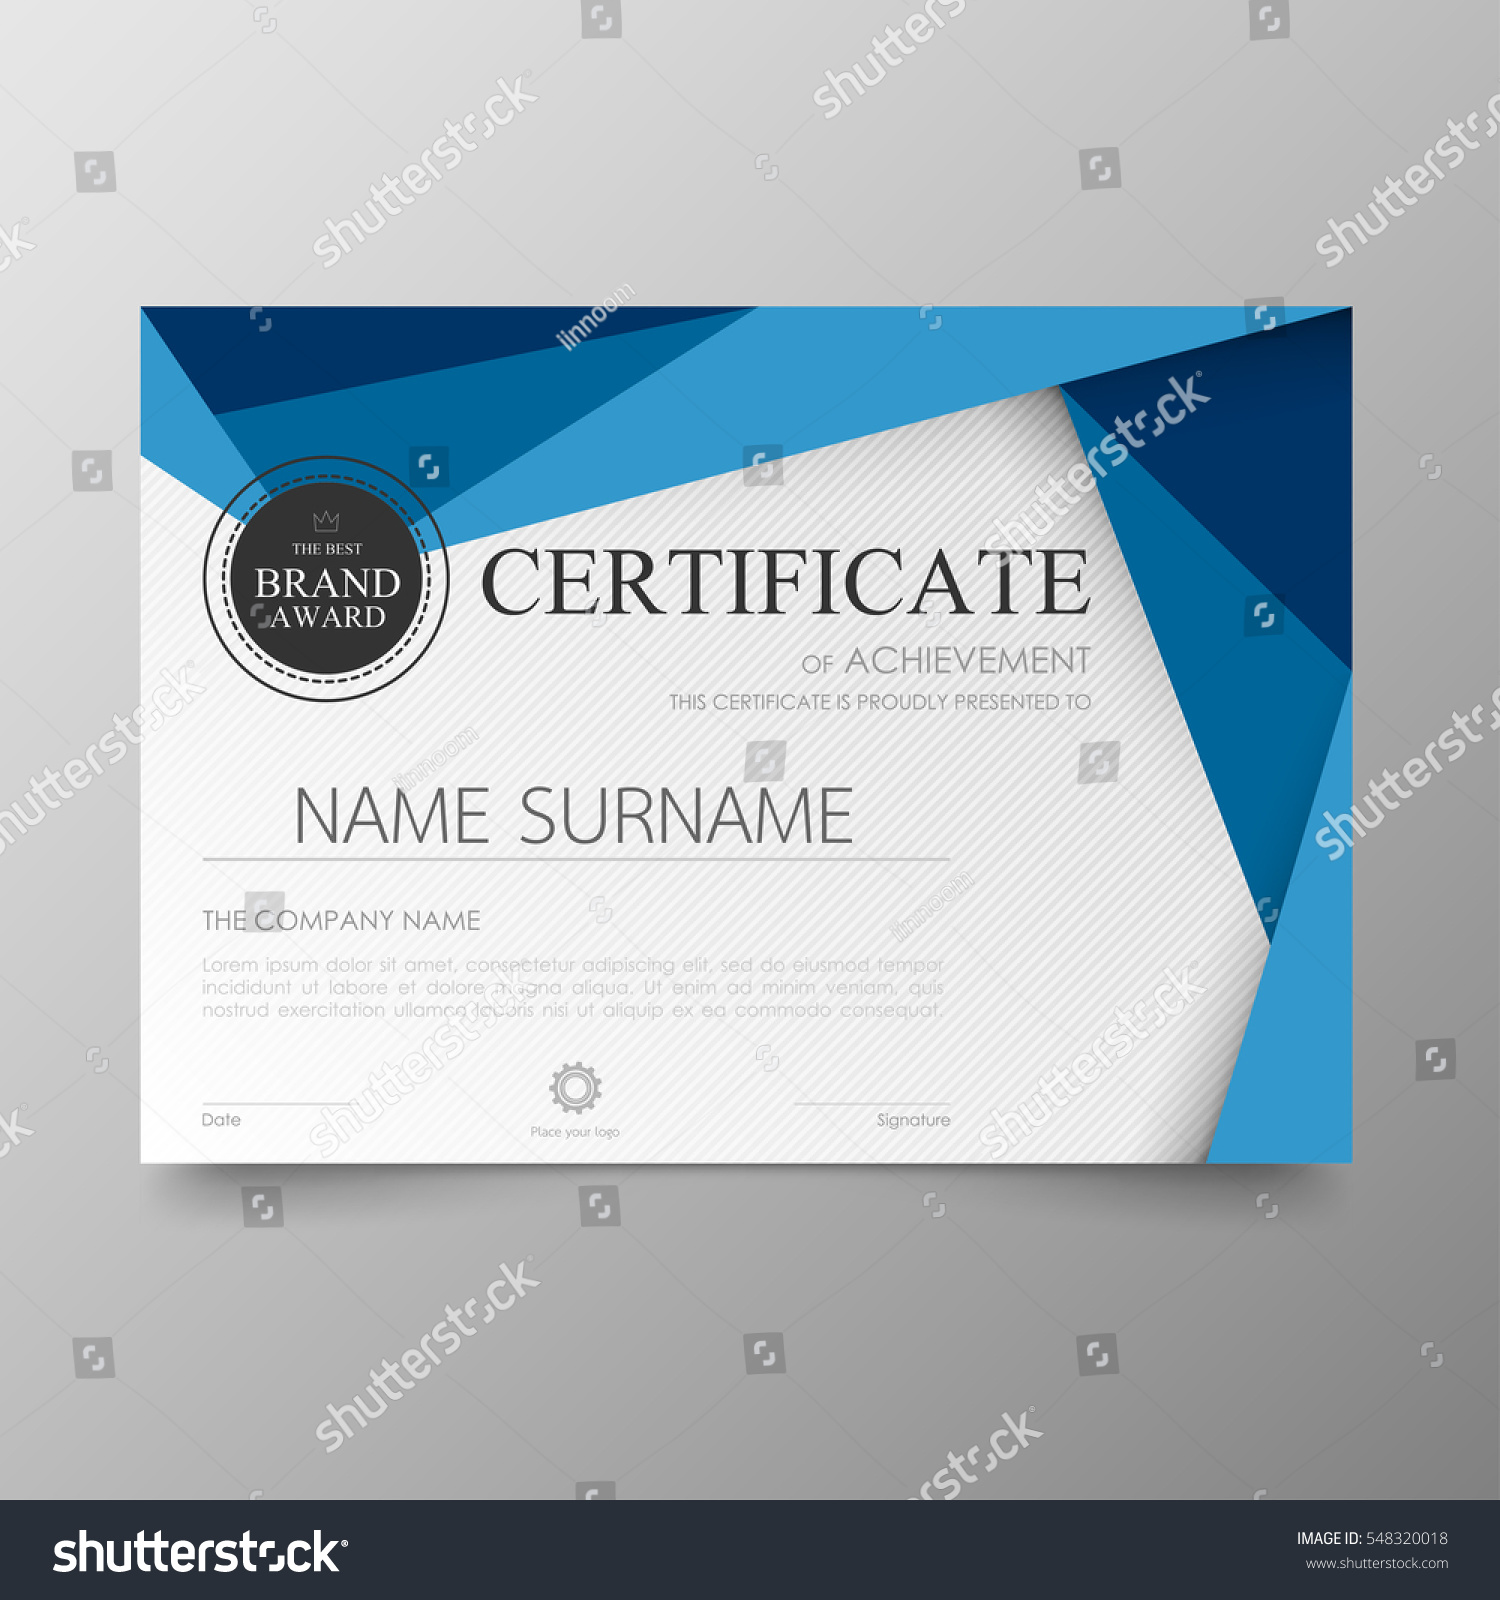 Online Certificate Templates